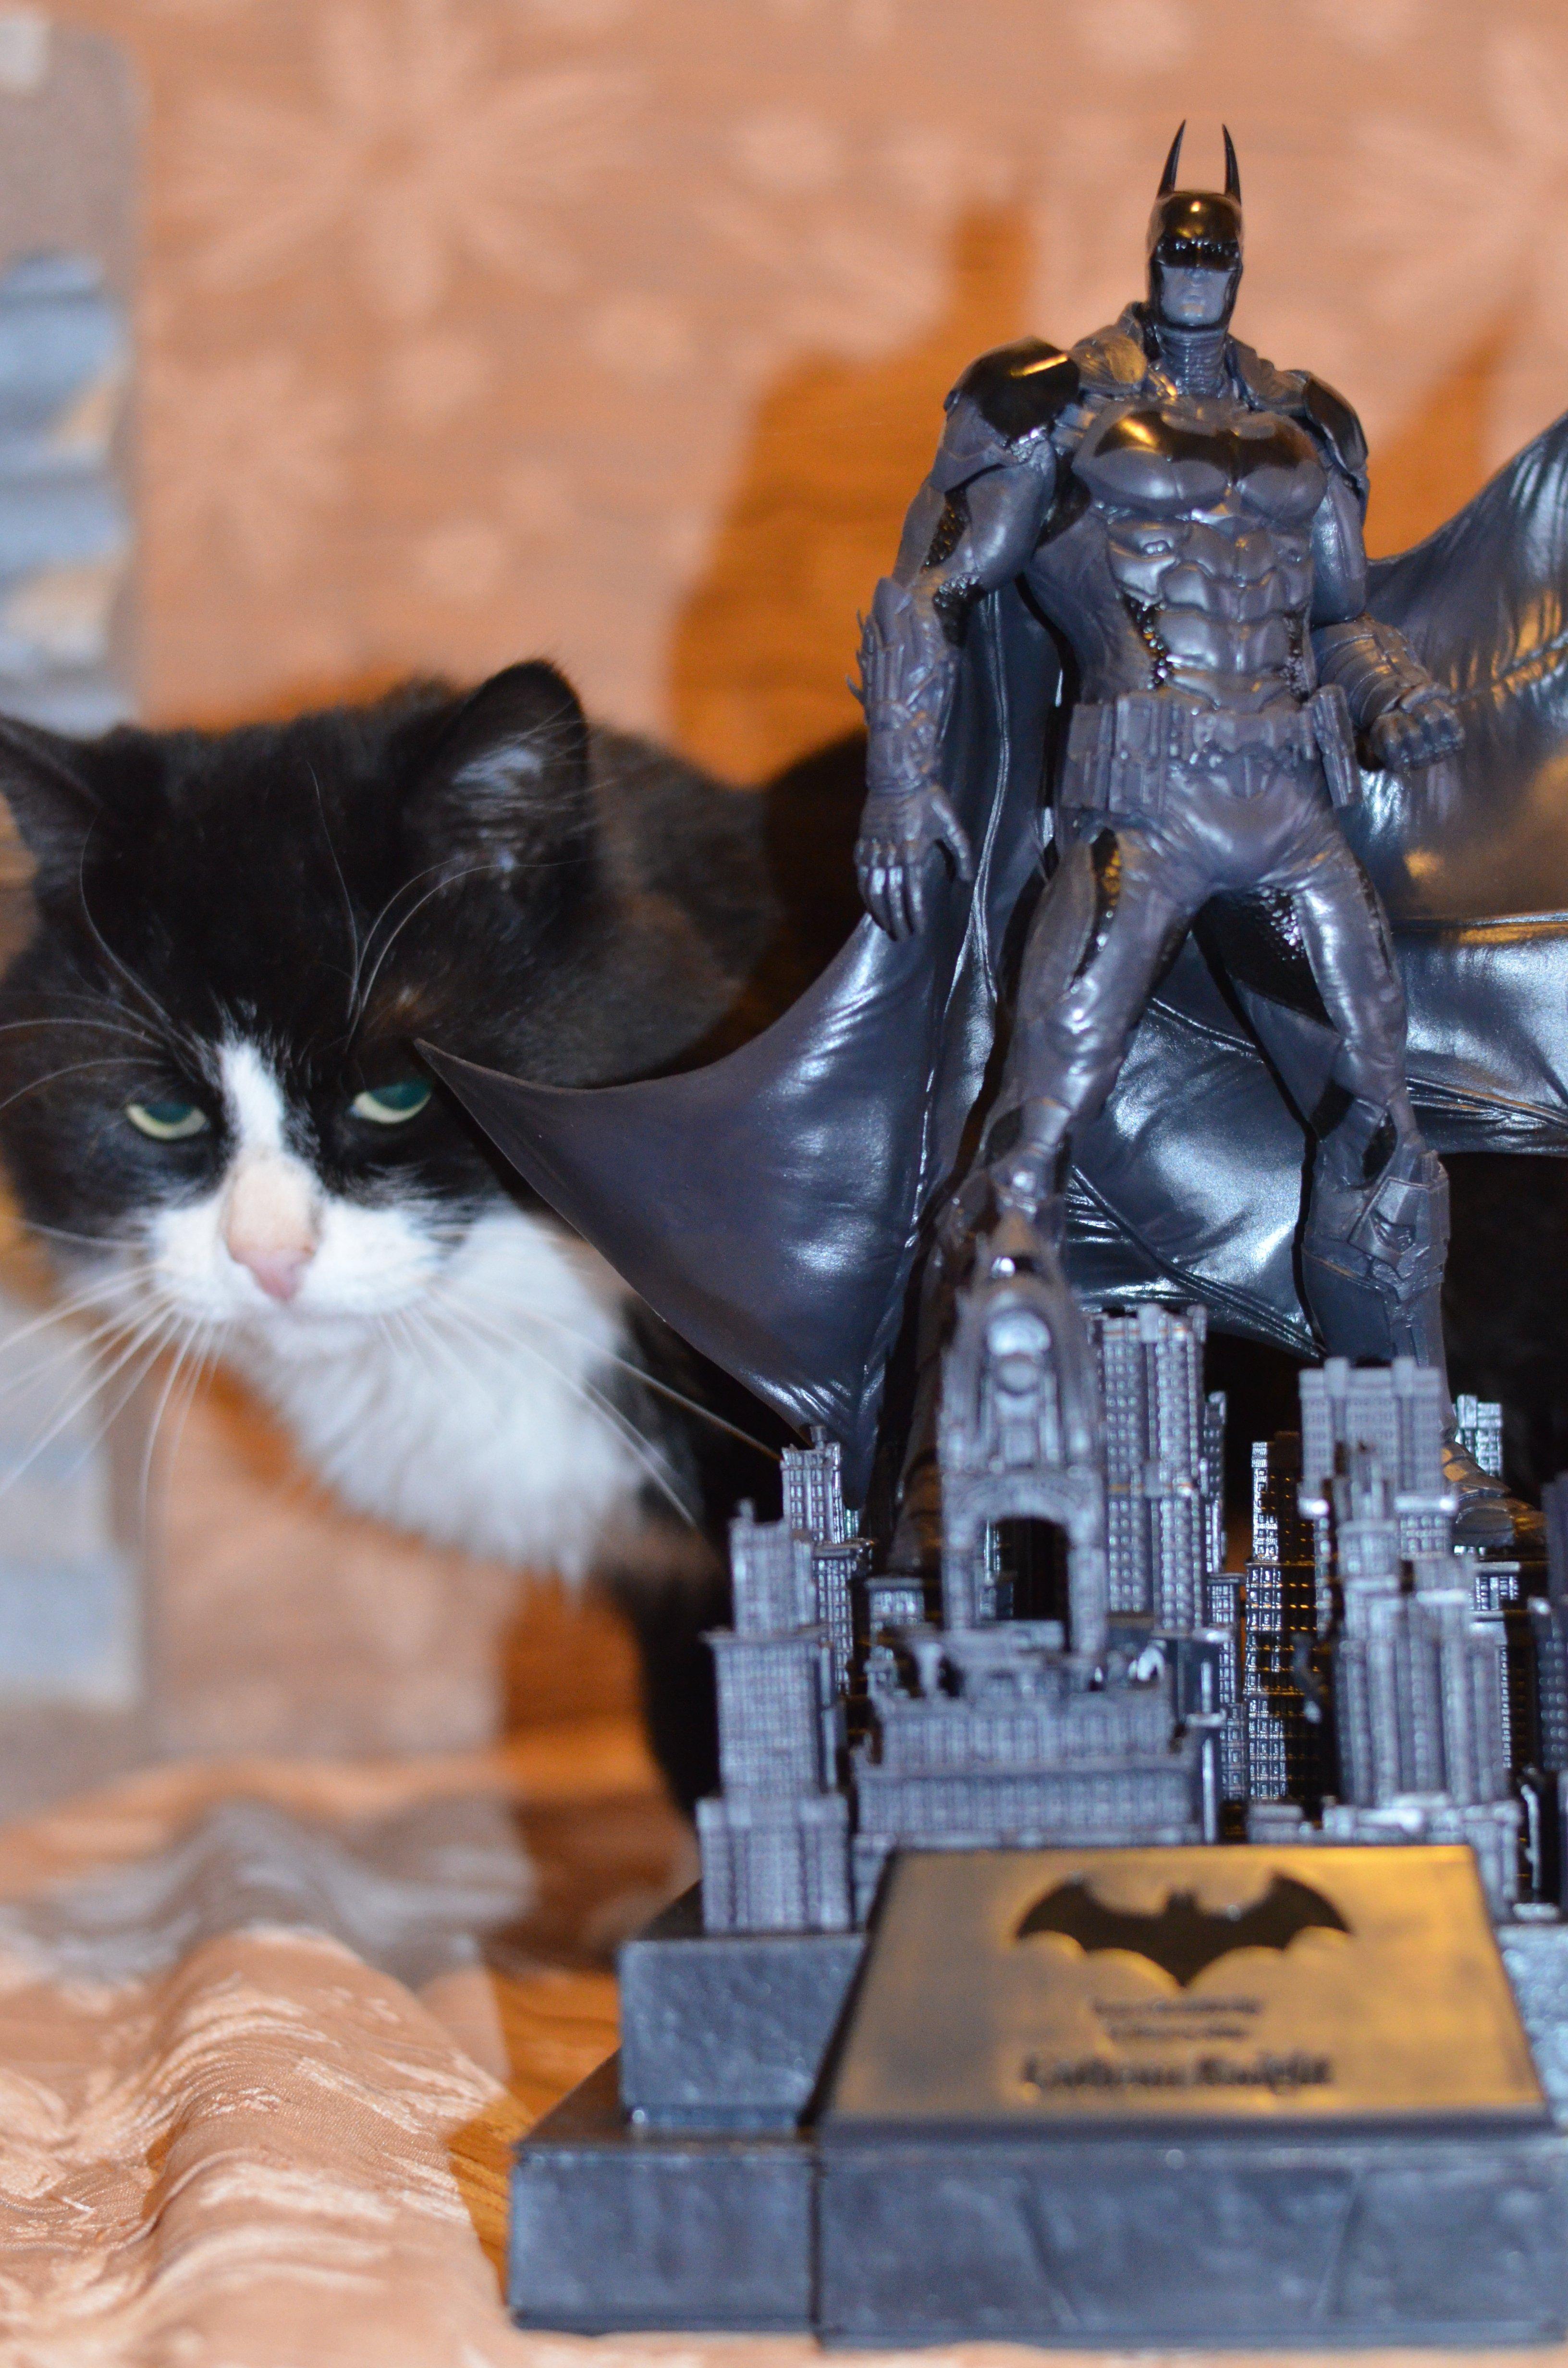 Анбоксинг Batman Arkham Knight limited edition (PS4) - Изображение 37